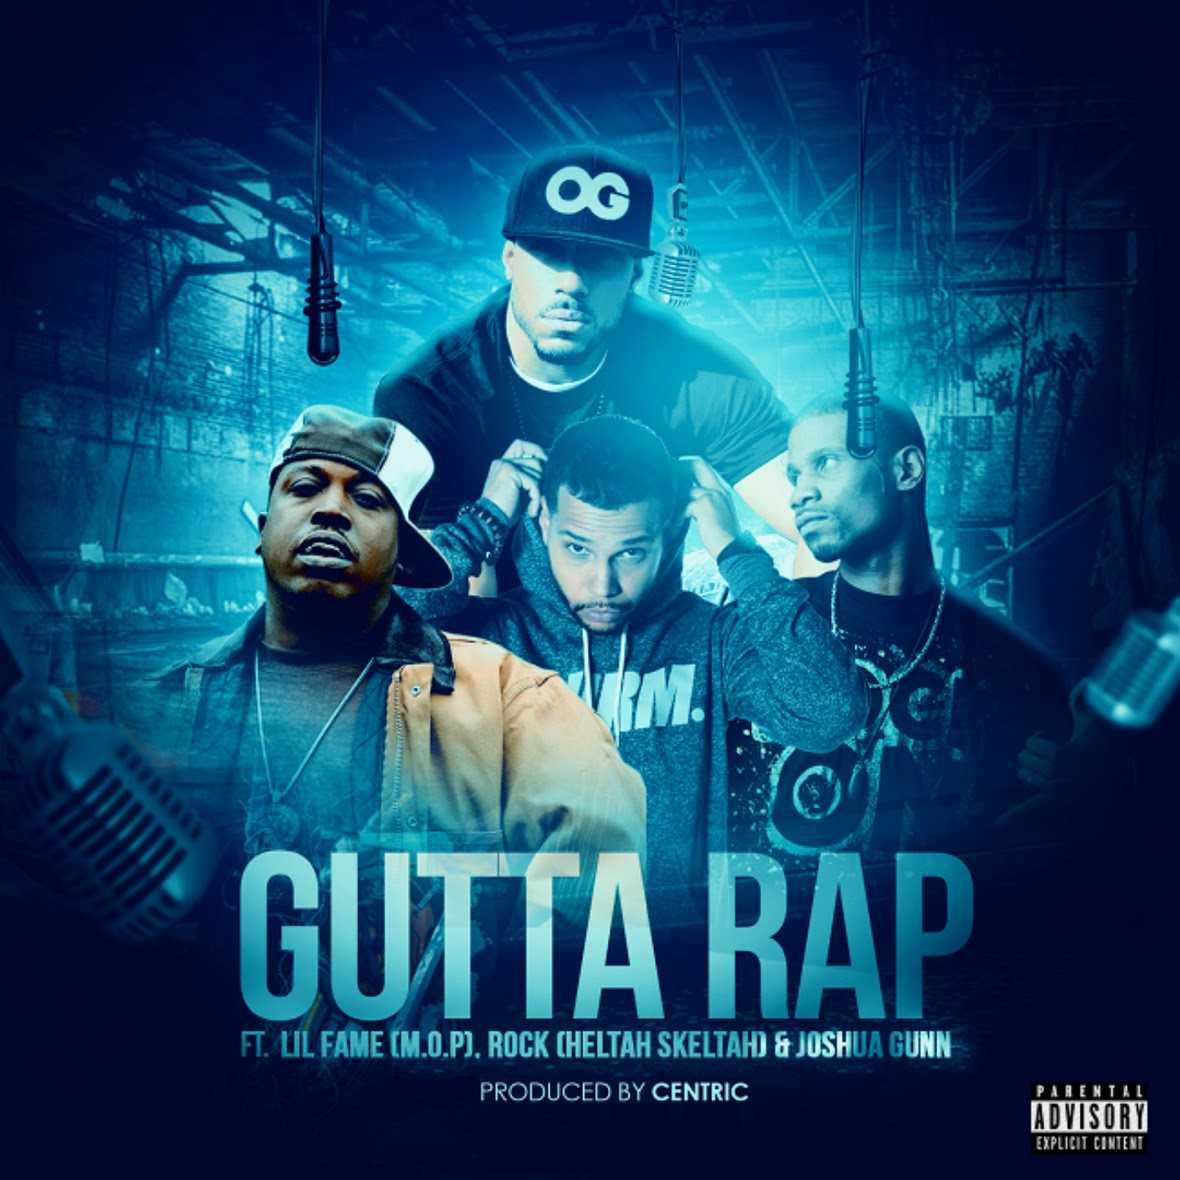 New Single: Centric ft. Lil Fame (M.O.P), Rockness (HELTAH SKELTAH) & J. Gunn | Gutta Rap [Audio]